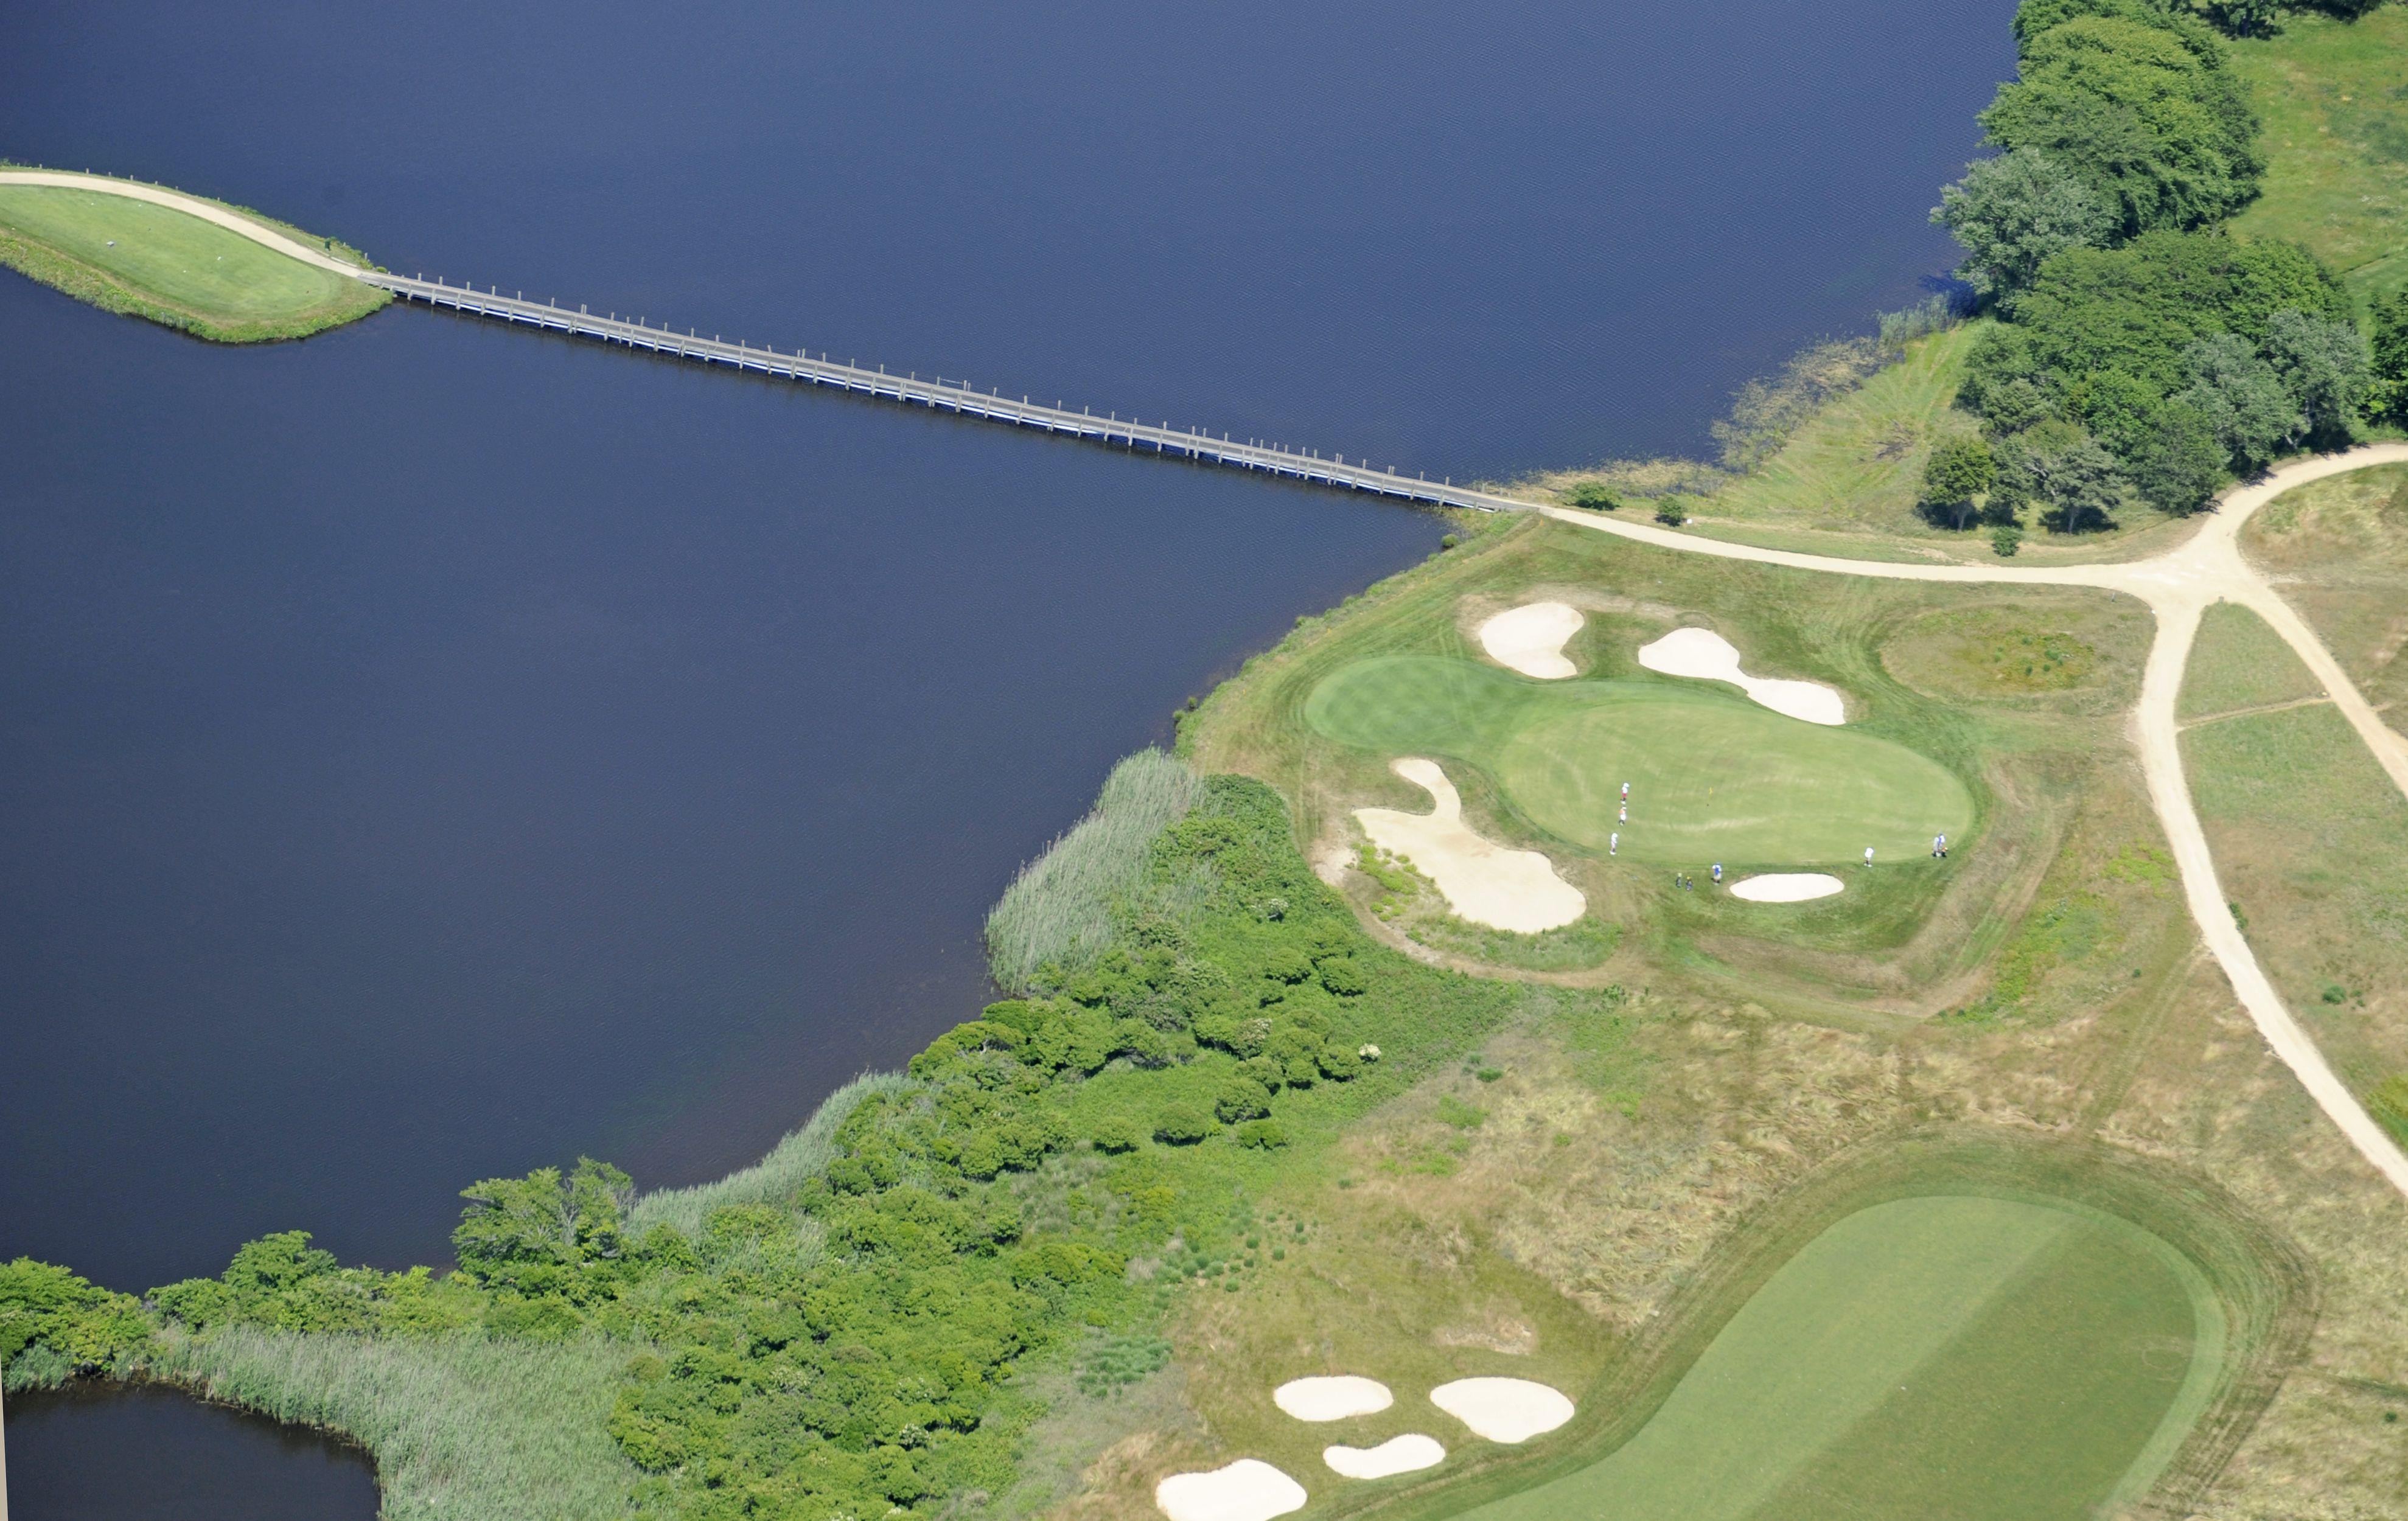 East Hampton - Maidstone Golf Club | Golf Courses | Best golf